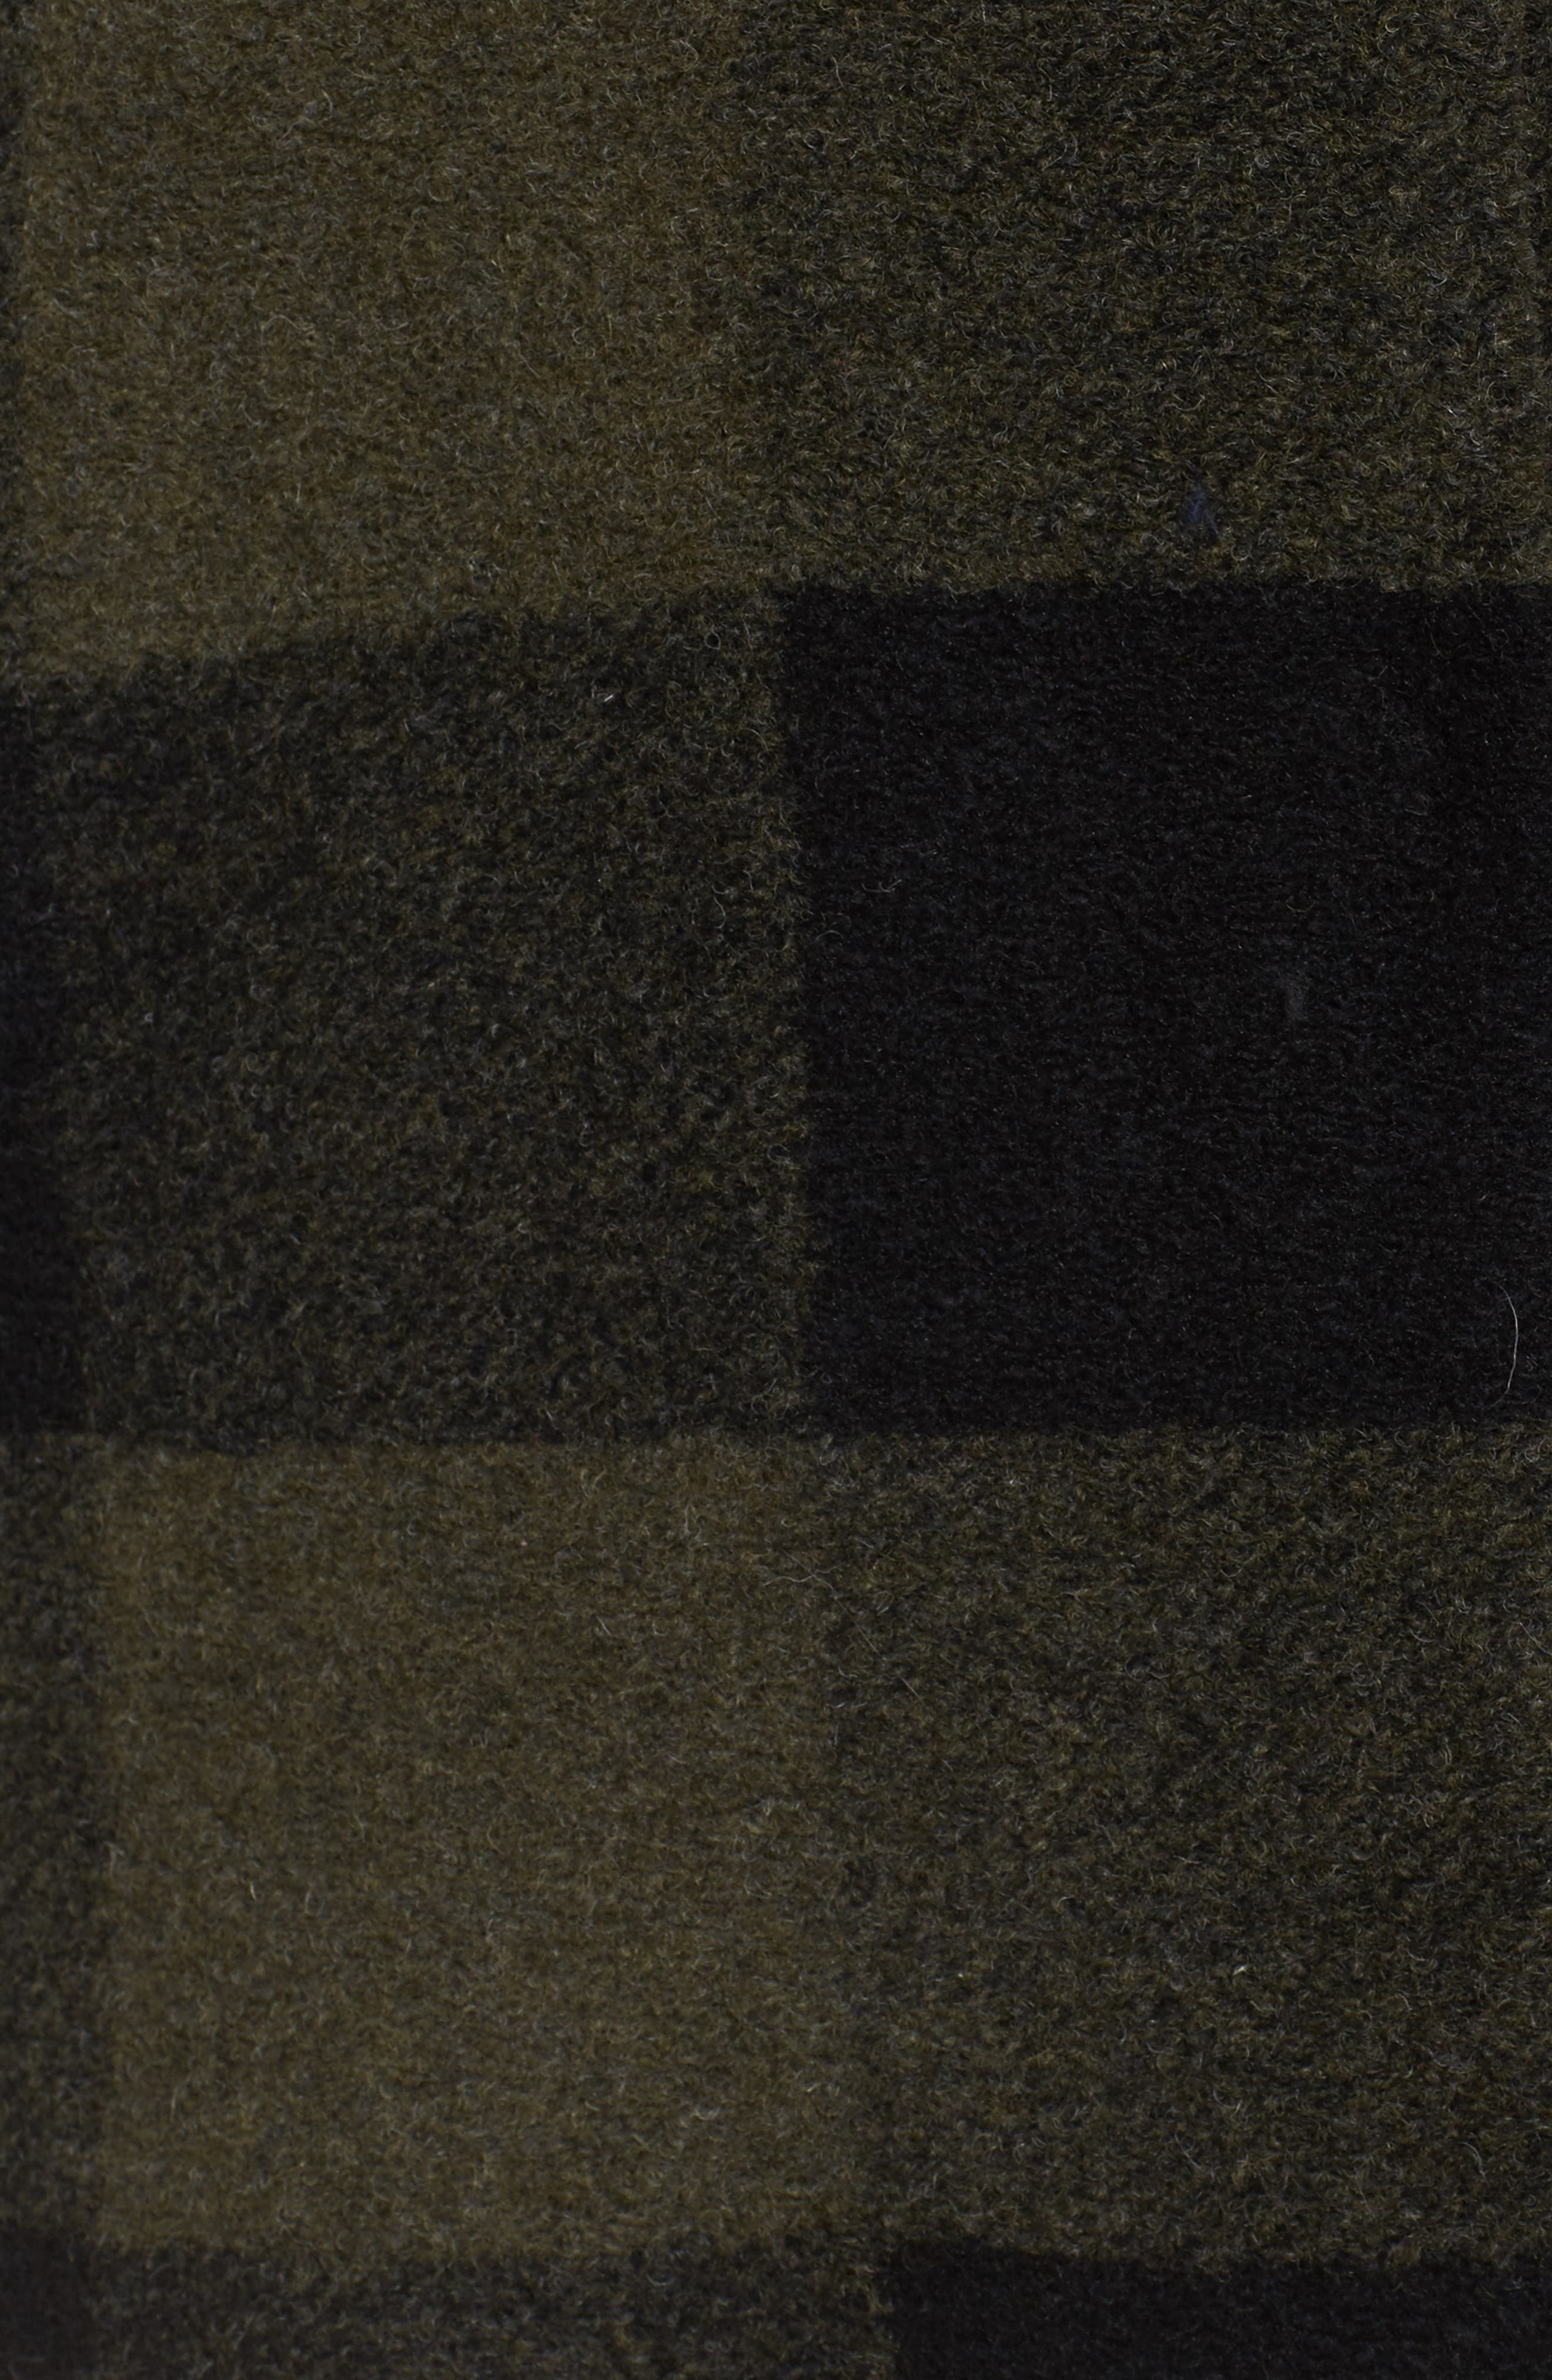 Paul Bunyan Plaid Wool Blend Barn Coat,                             Alternate thumbnail 5, color,                             Olive/ Buff